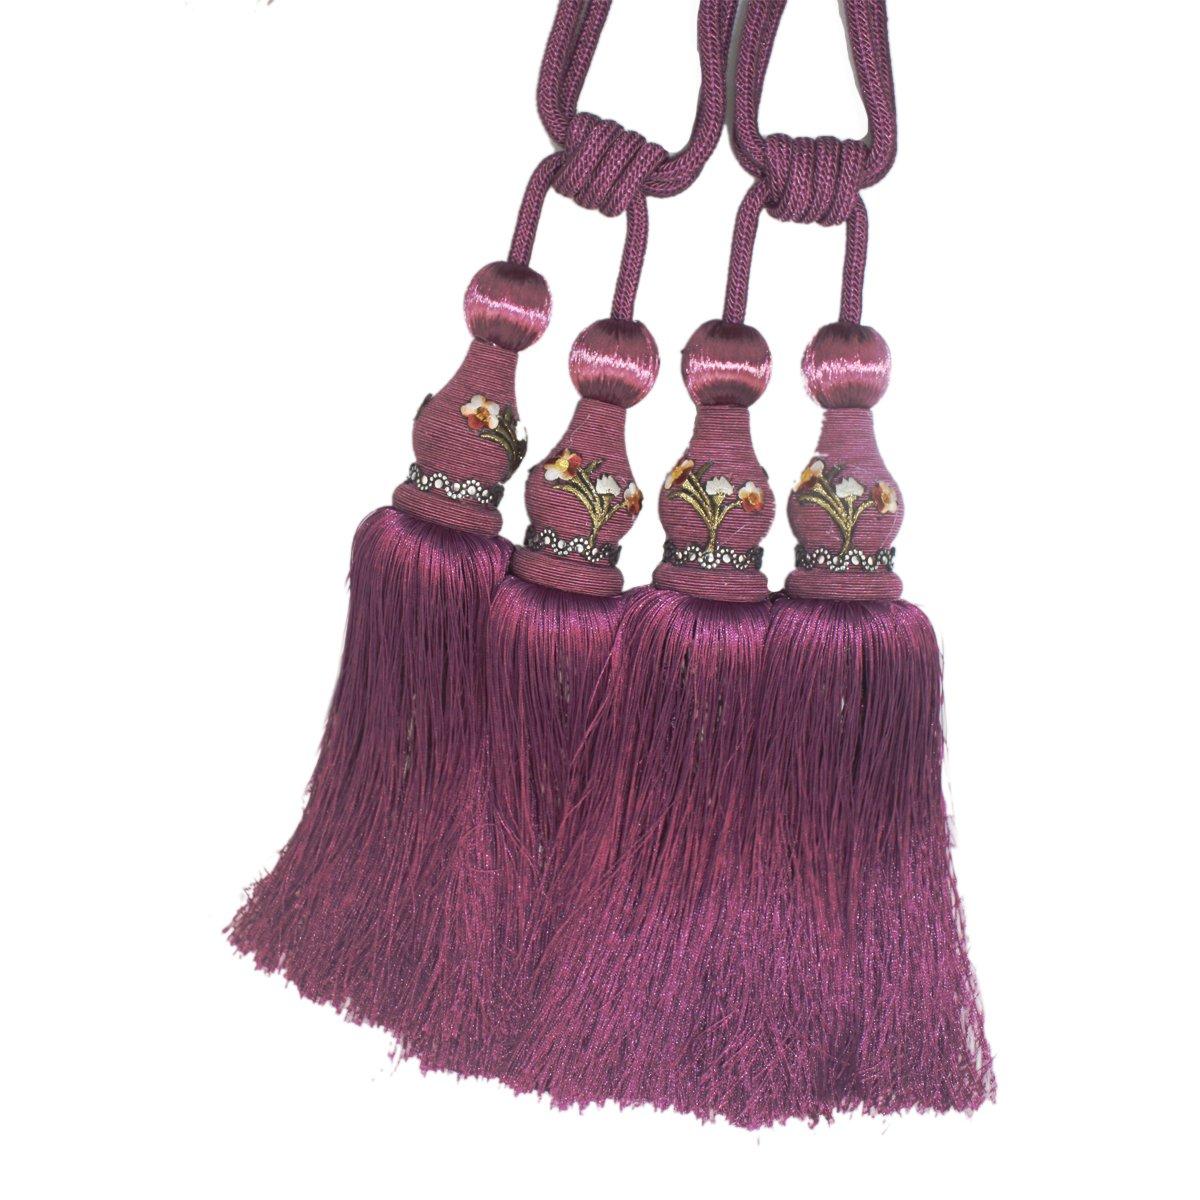 Fangbay One Pair 4 pcs tassel curtain Crystal curtain hanging ball(twin ball style) for Curtains Tiebacks Rope,Curtains Buckle Holdbacks Tiebacks Tassel Window Rope Tie Ball (purple)